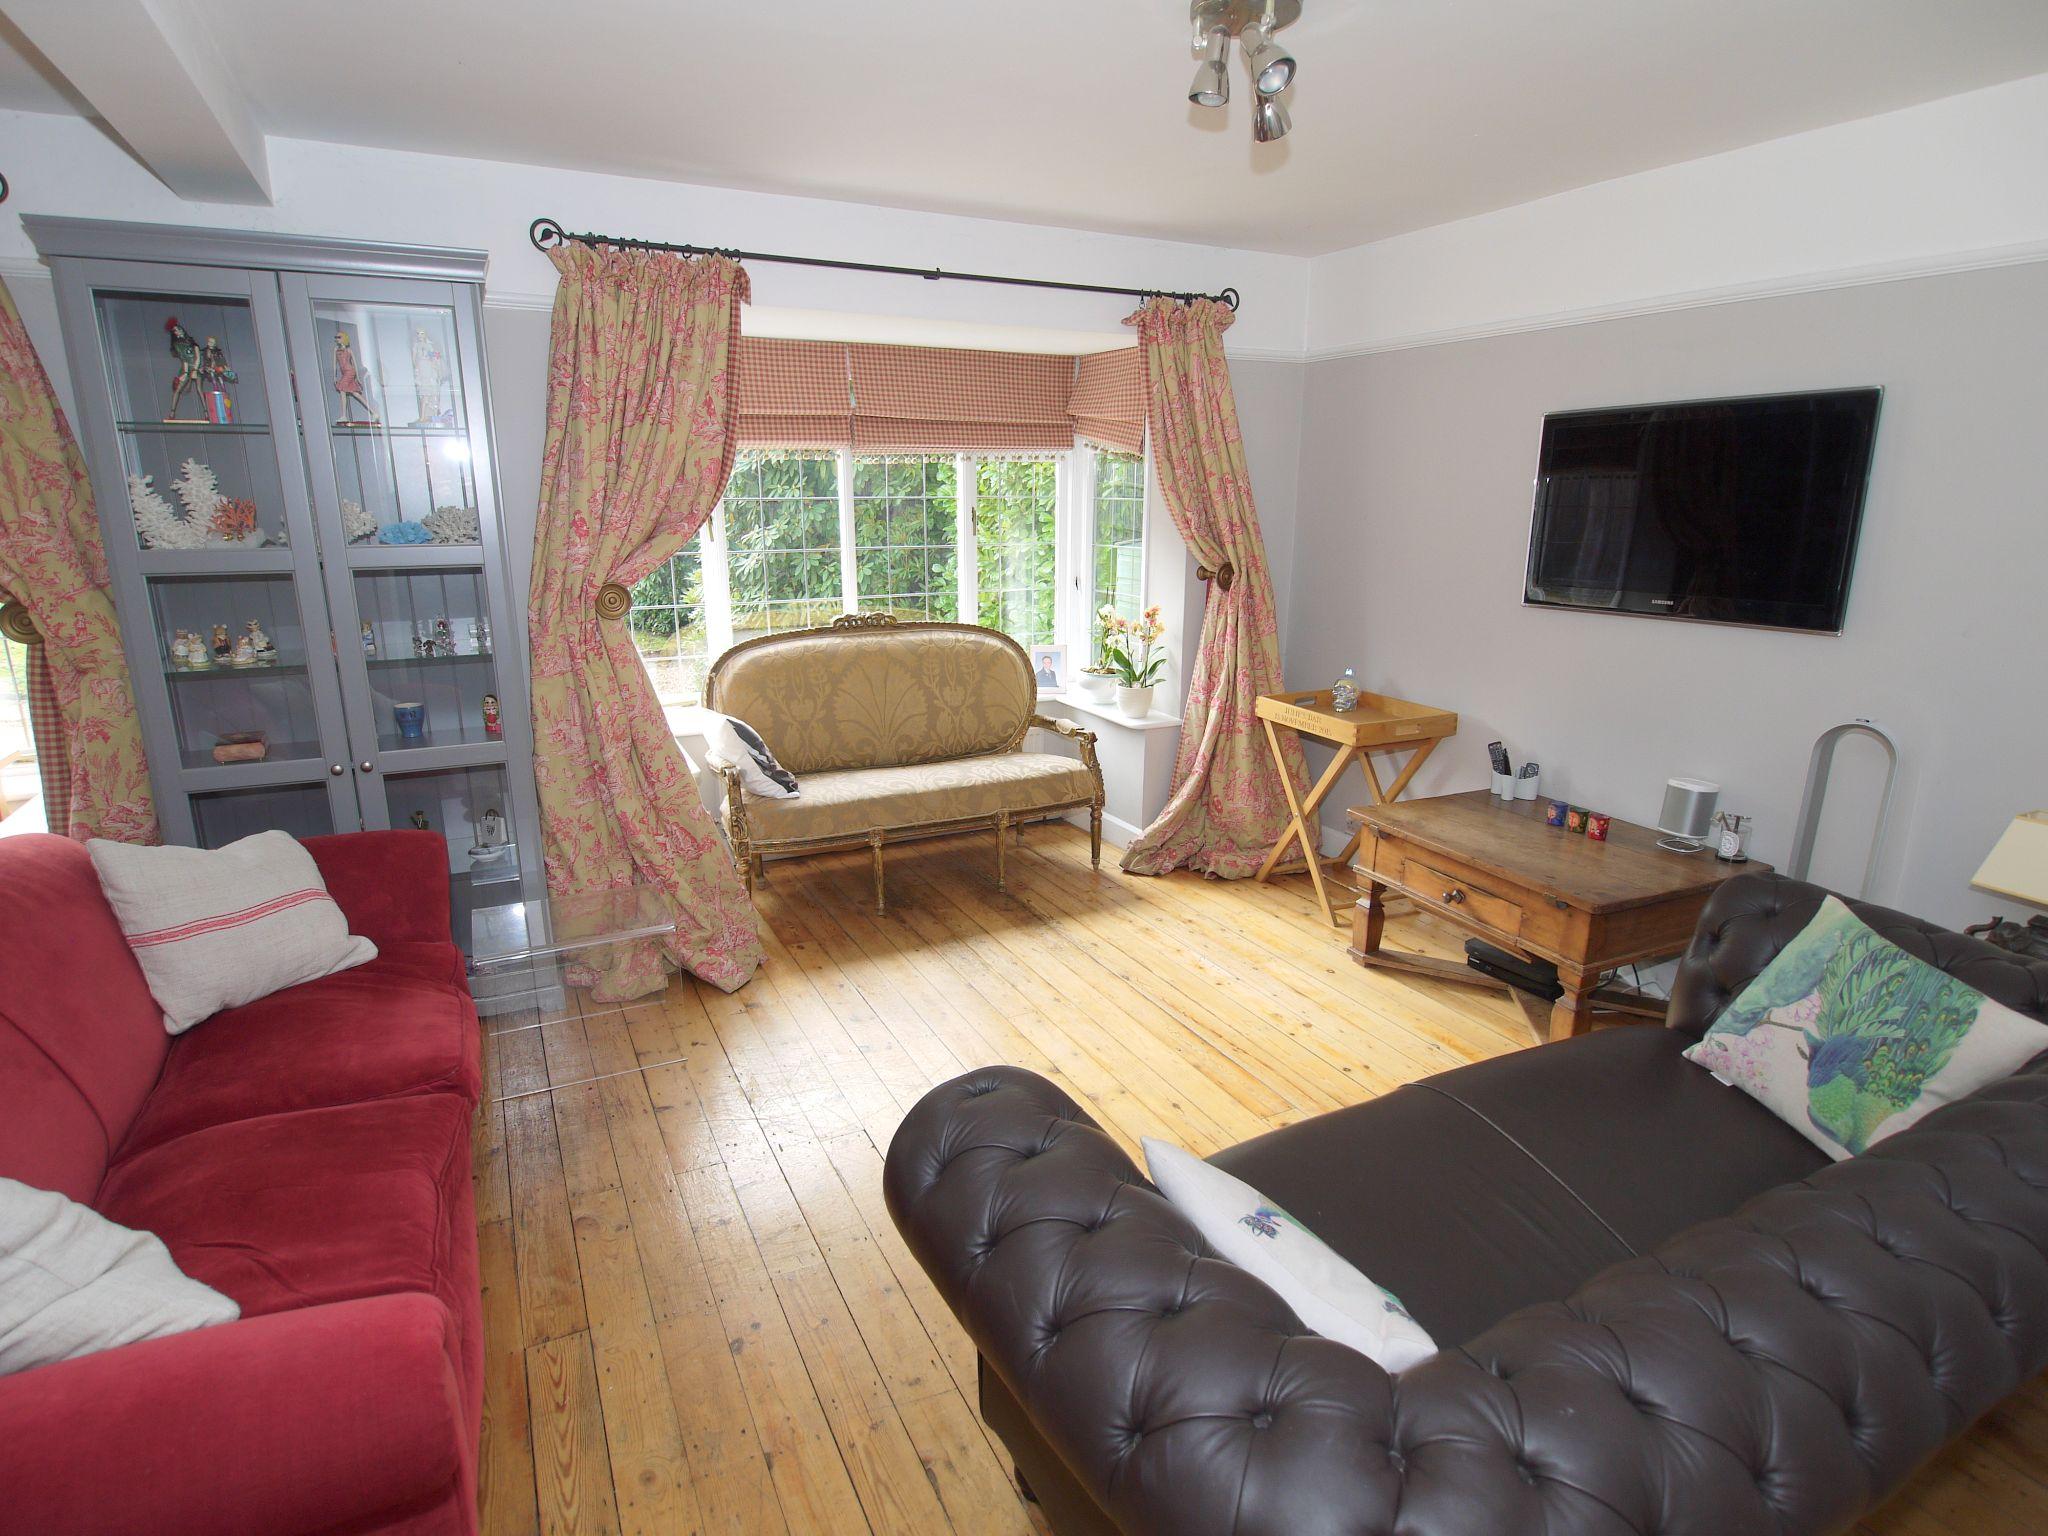 3 bedroom detached house Sold in Sevenoaks - Photograph 3